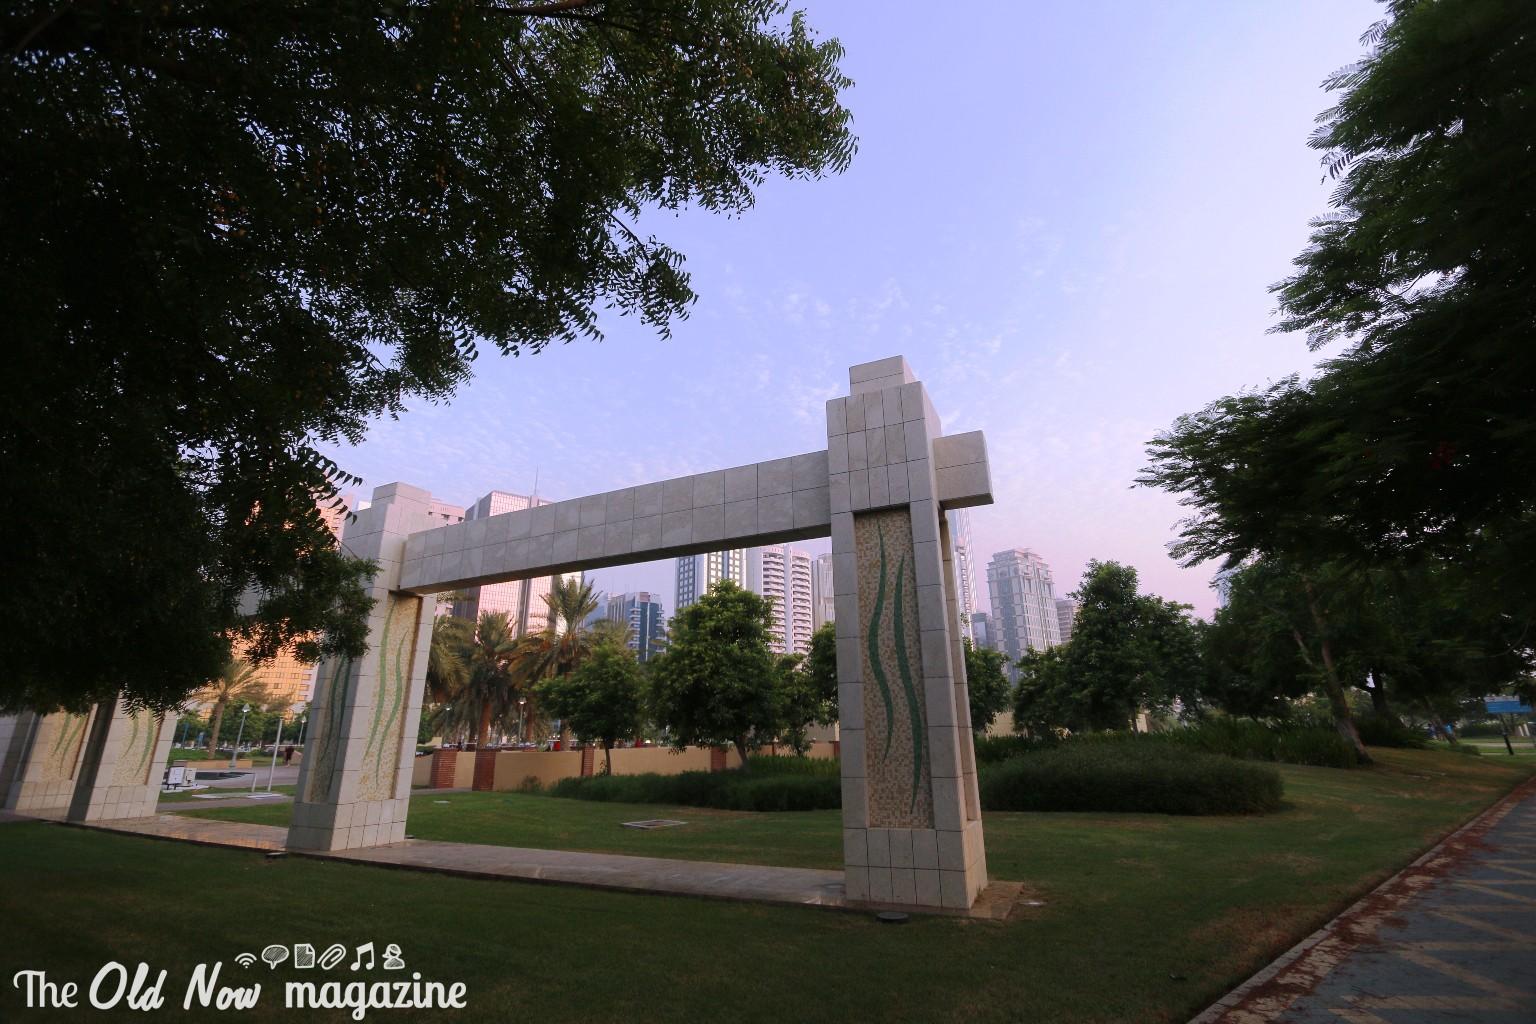 Abu Dhabi THEOLDNOW DAY 1 (25)